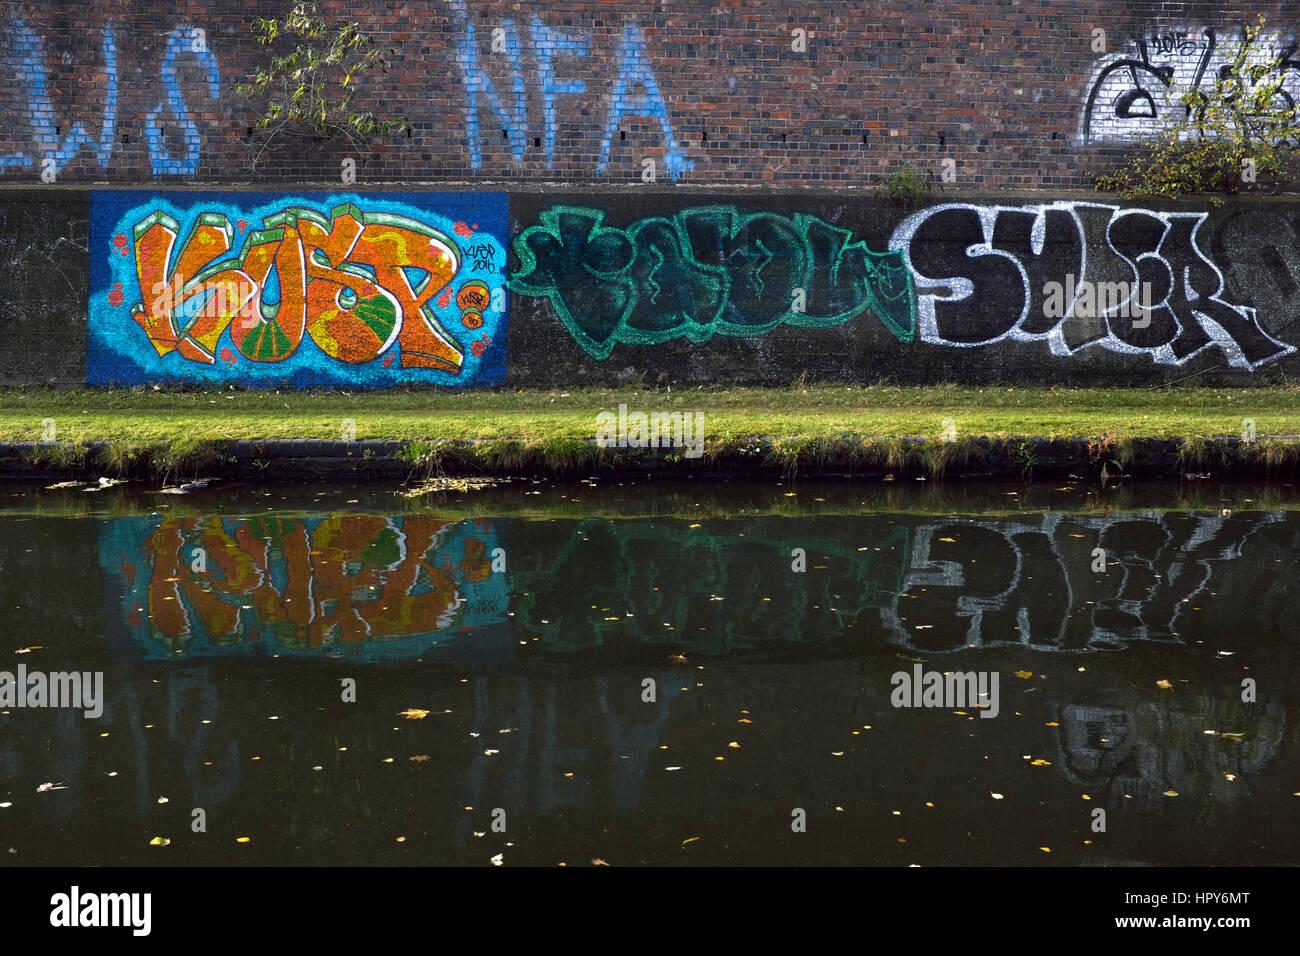 Grafitti on the Birmingham Canal Navigations (Old Main Line) towpath, Smethwick, West Midlands, England, UK - Stock Image